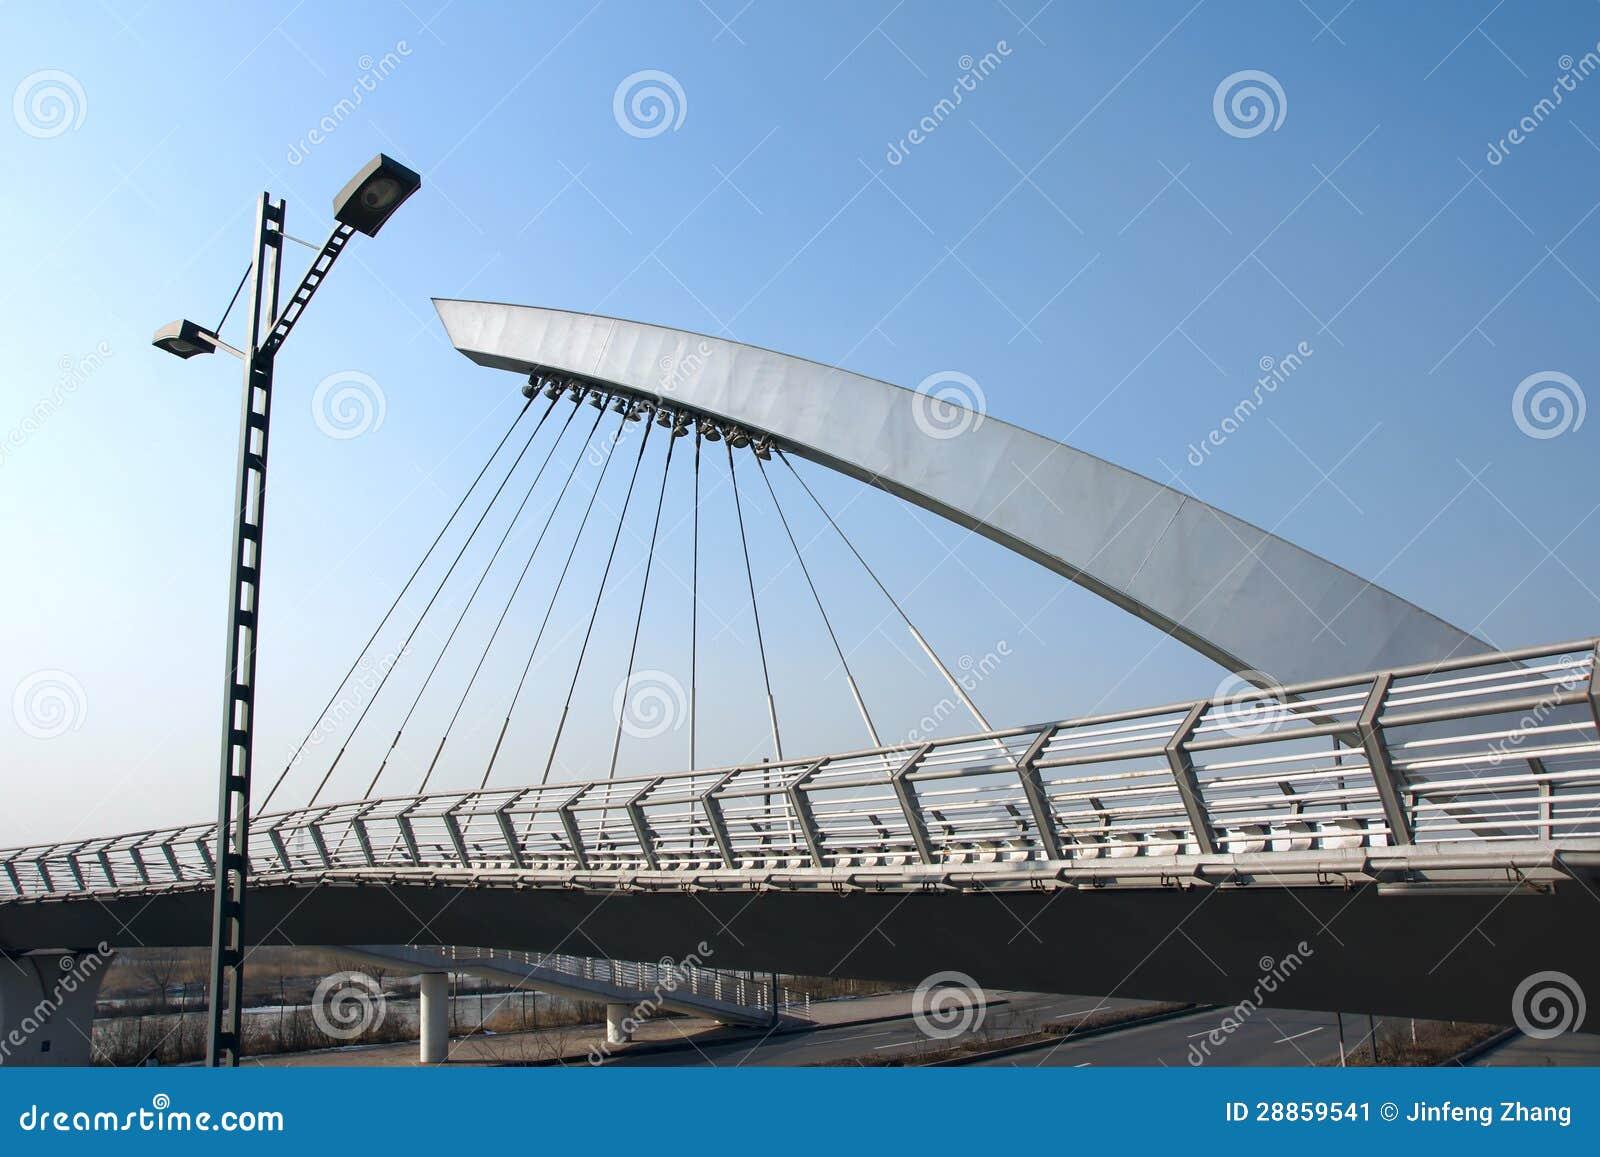 how to build a cable suspension bridge